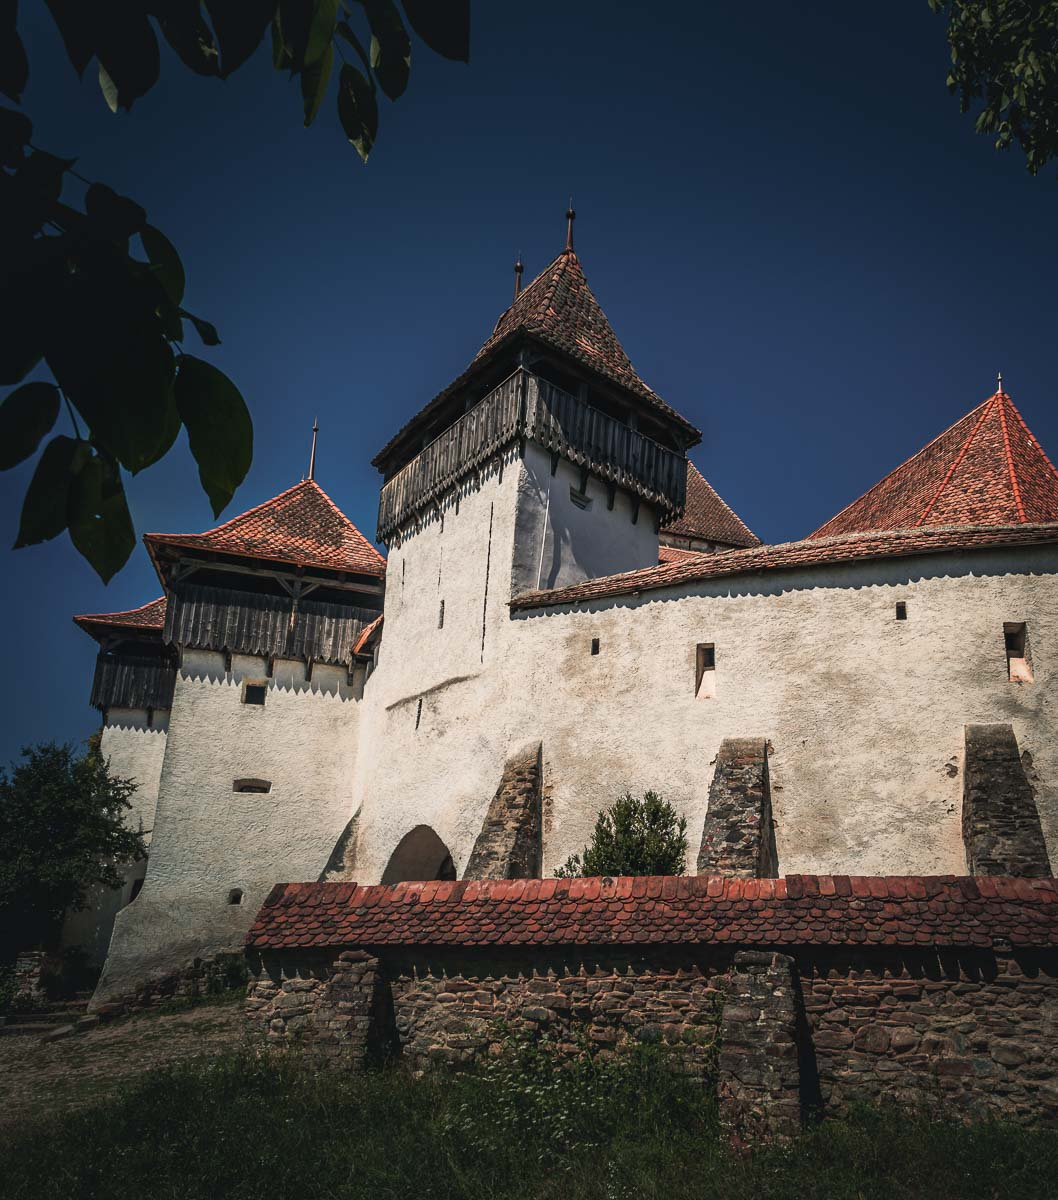 The Fortified Church in Viscri.